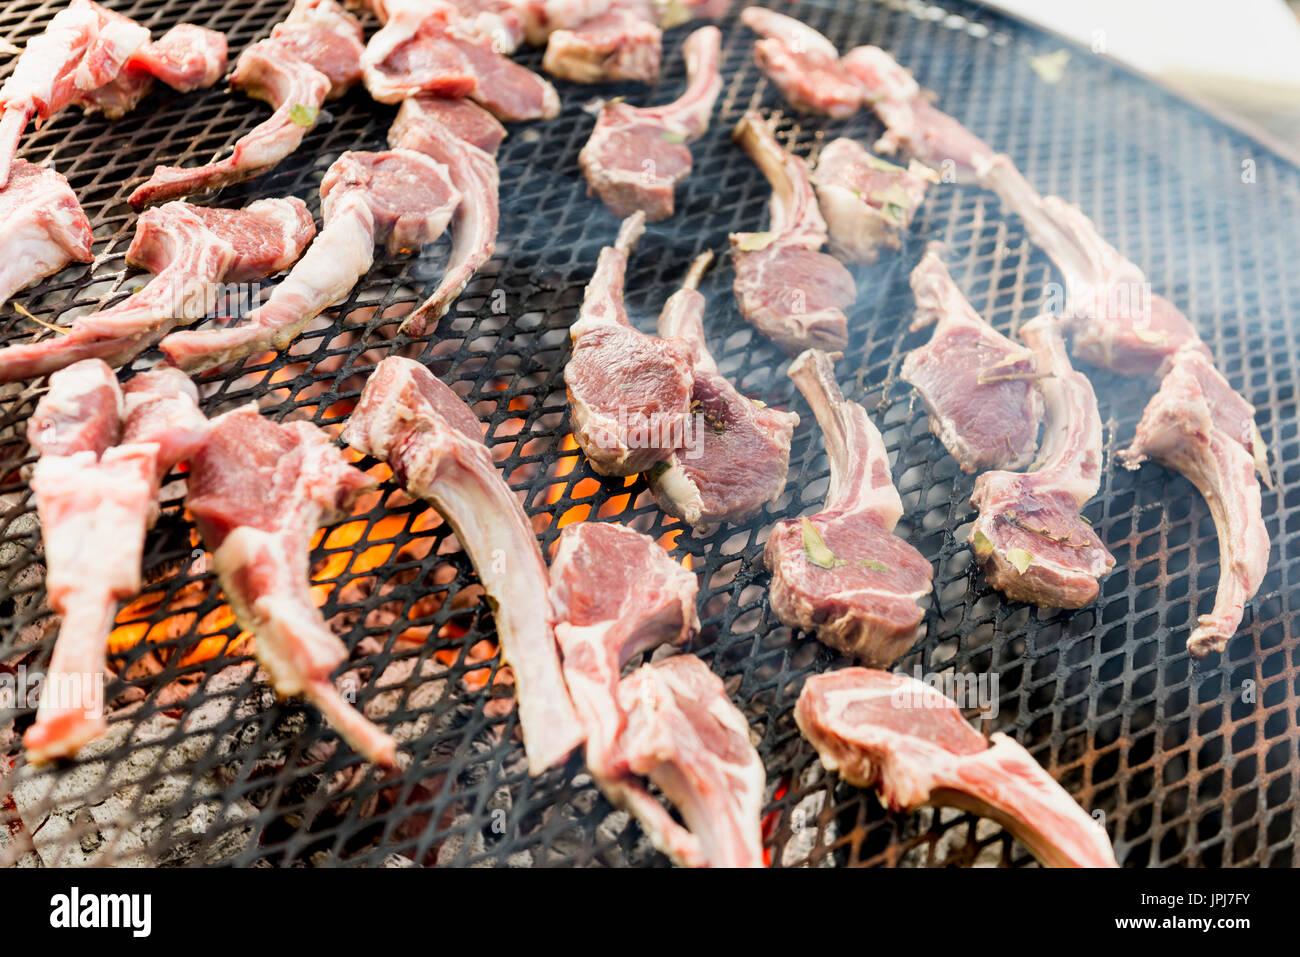 grilling lamb chops - Stock Image